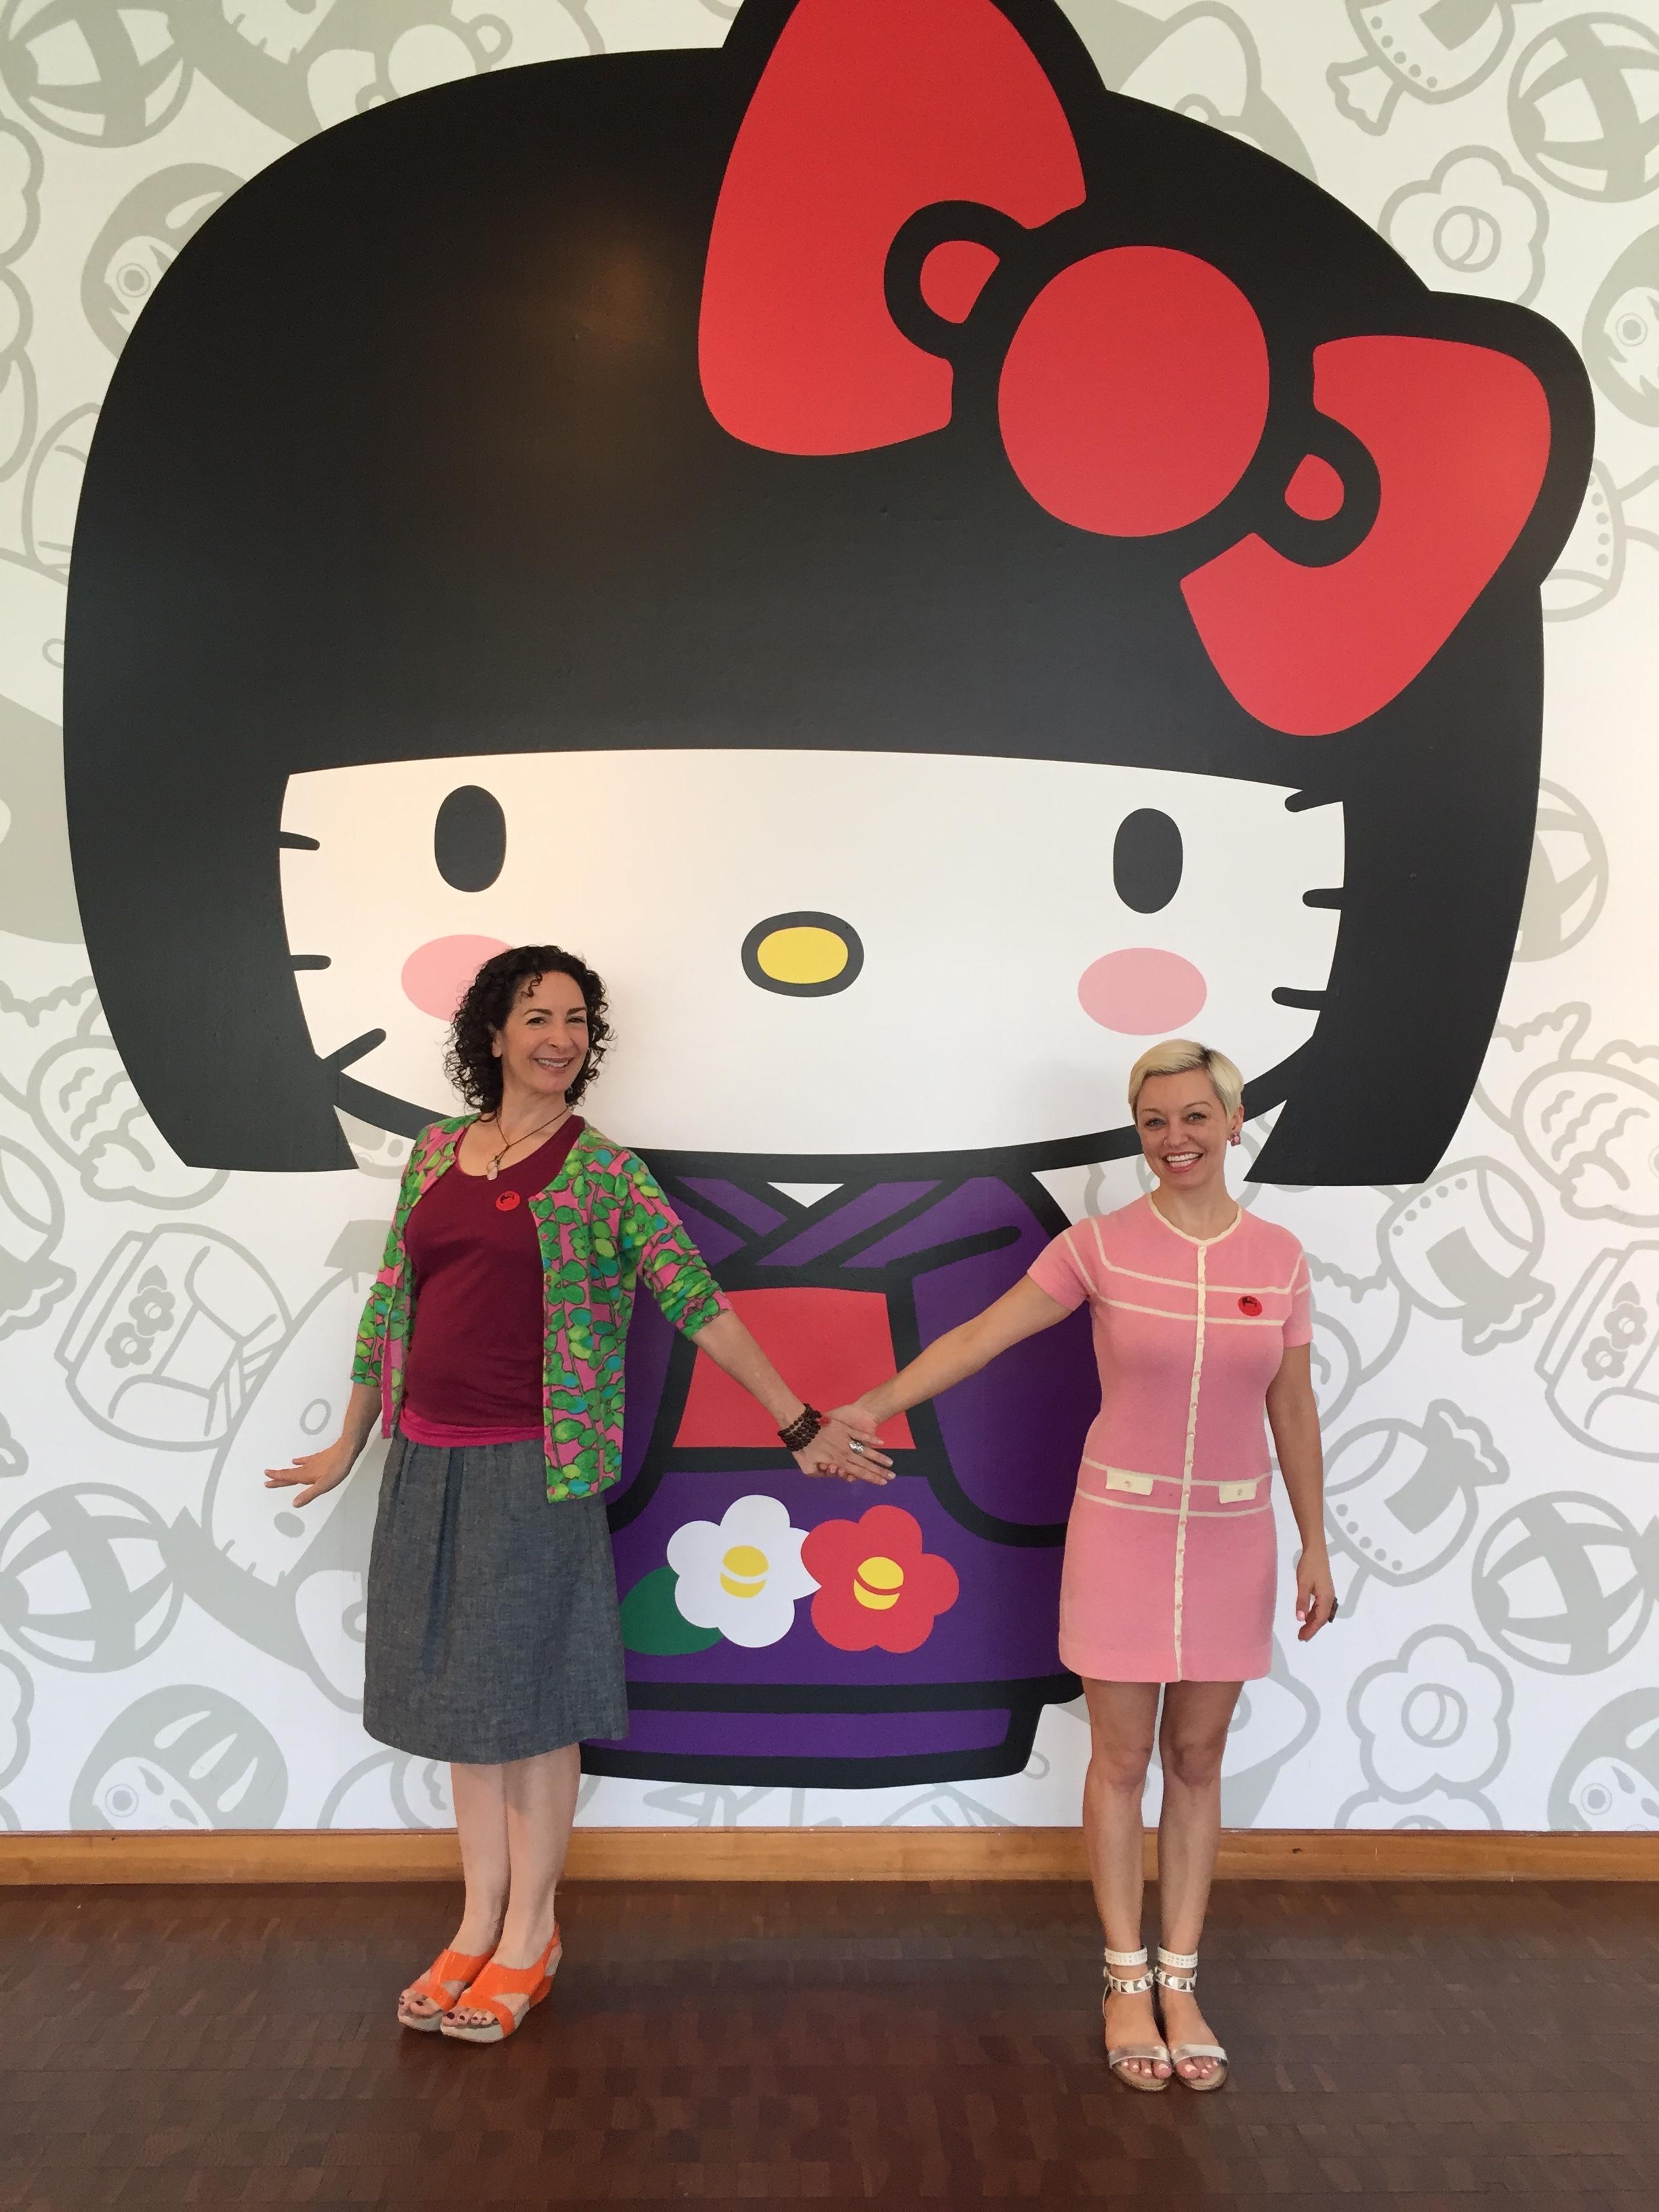 Hello Kitty - Exploring the Super Cute world of Hello Kitty